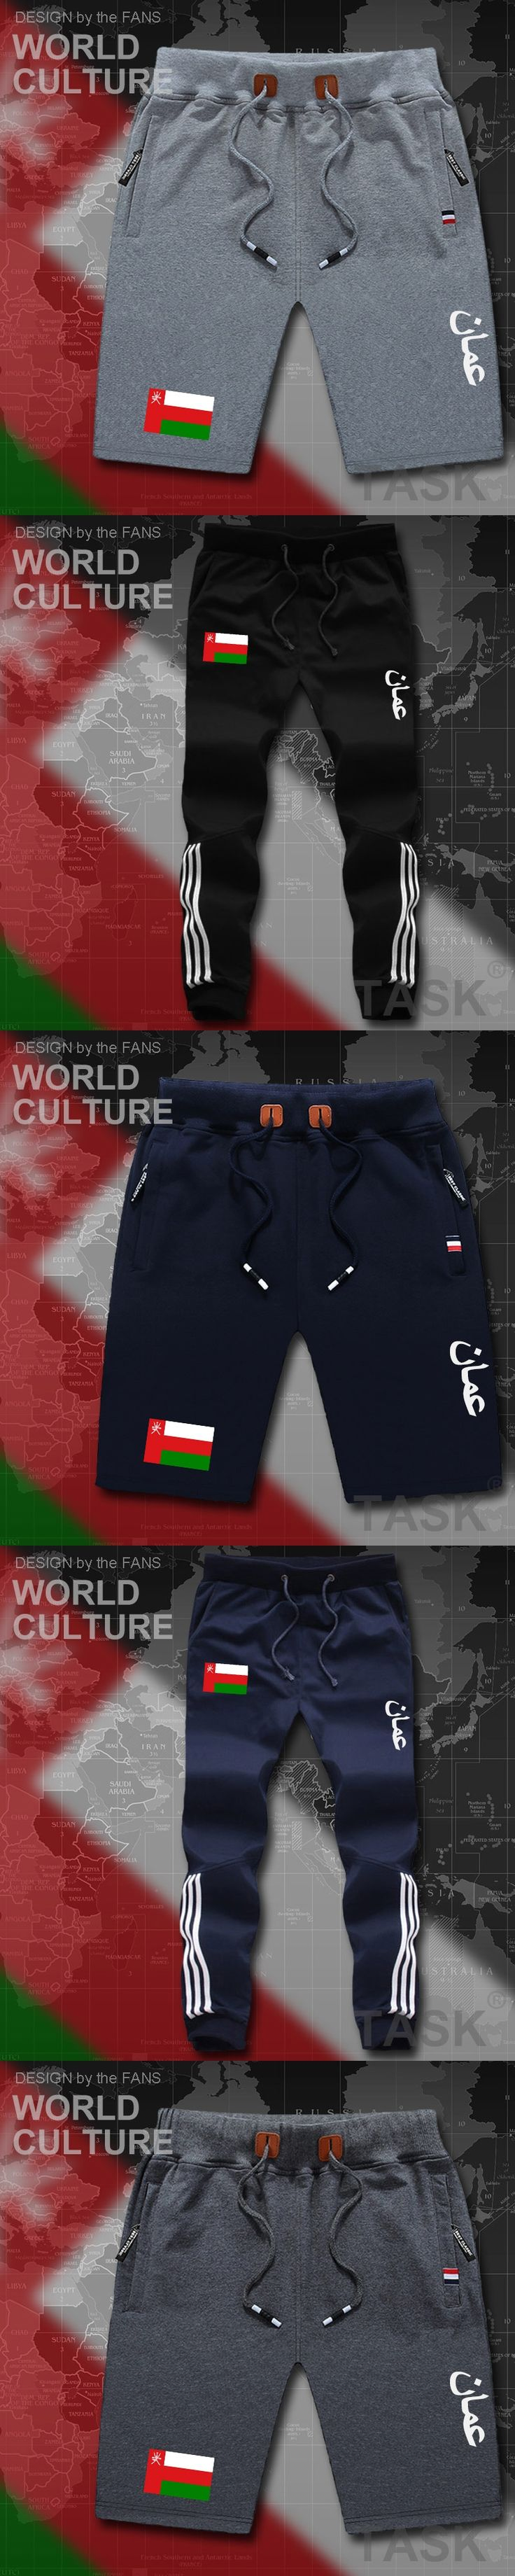 Sultanate of Oman Omani mens shorts beach man men's board shorts flag workout zipper pocket sweat bodybuilding  OMN Arabic print